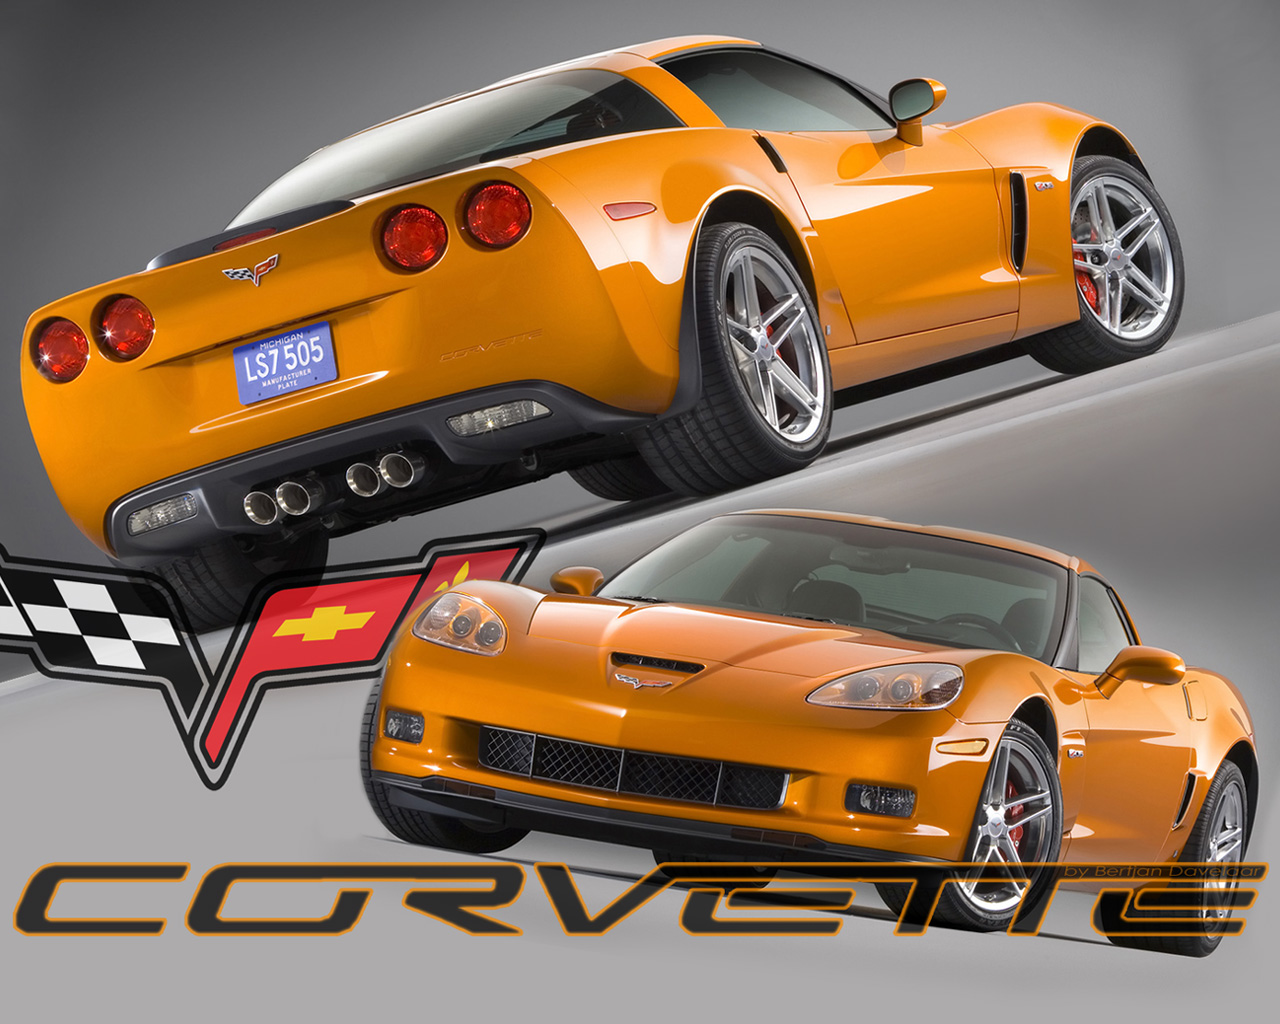 Corvette C6 Z06 wallpaper 1280x1024